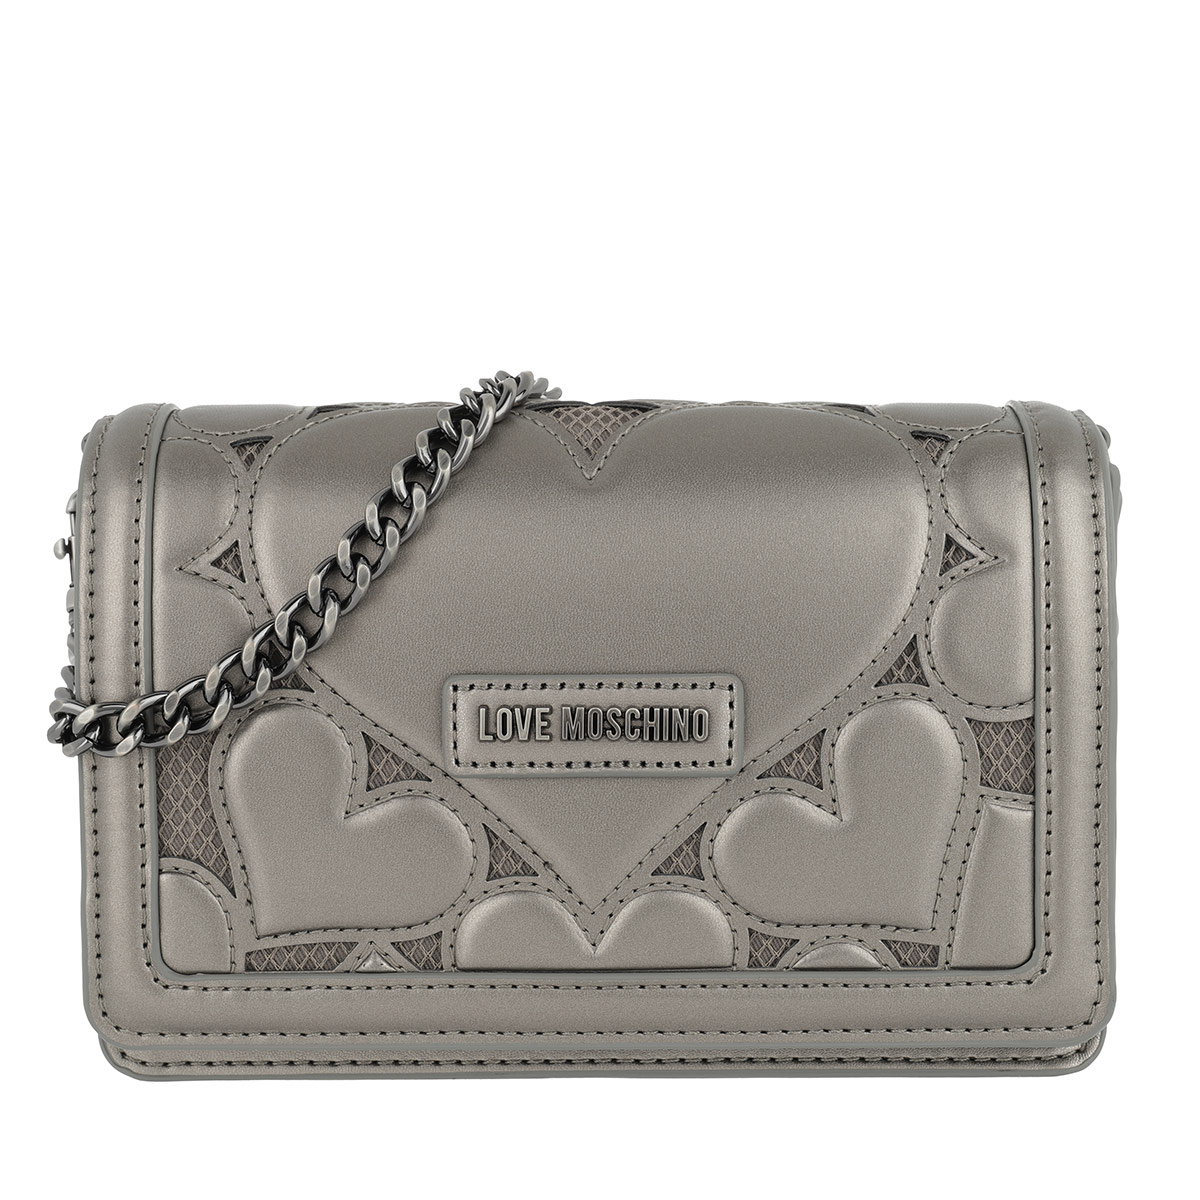 Love Moschino Umhängetasche - Embossed Lamb Crossbody Bag Peltro - in grau - für Damen